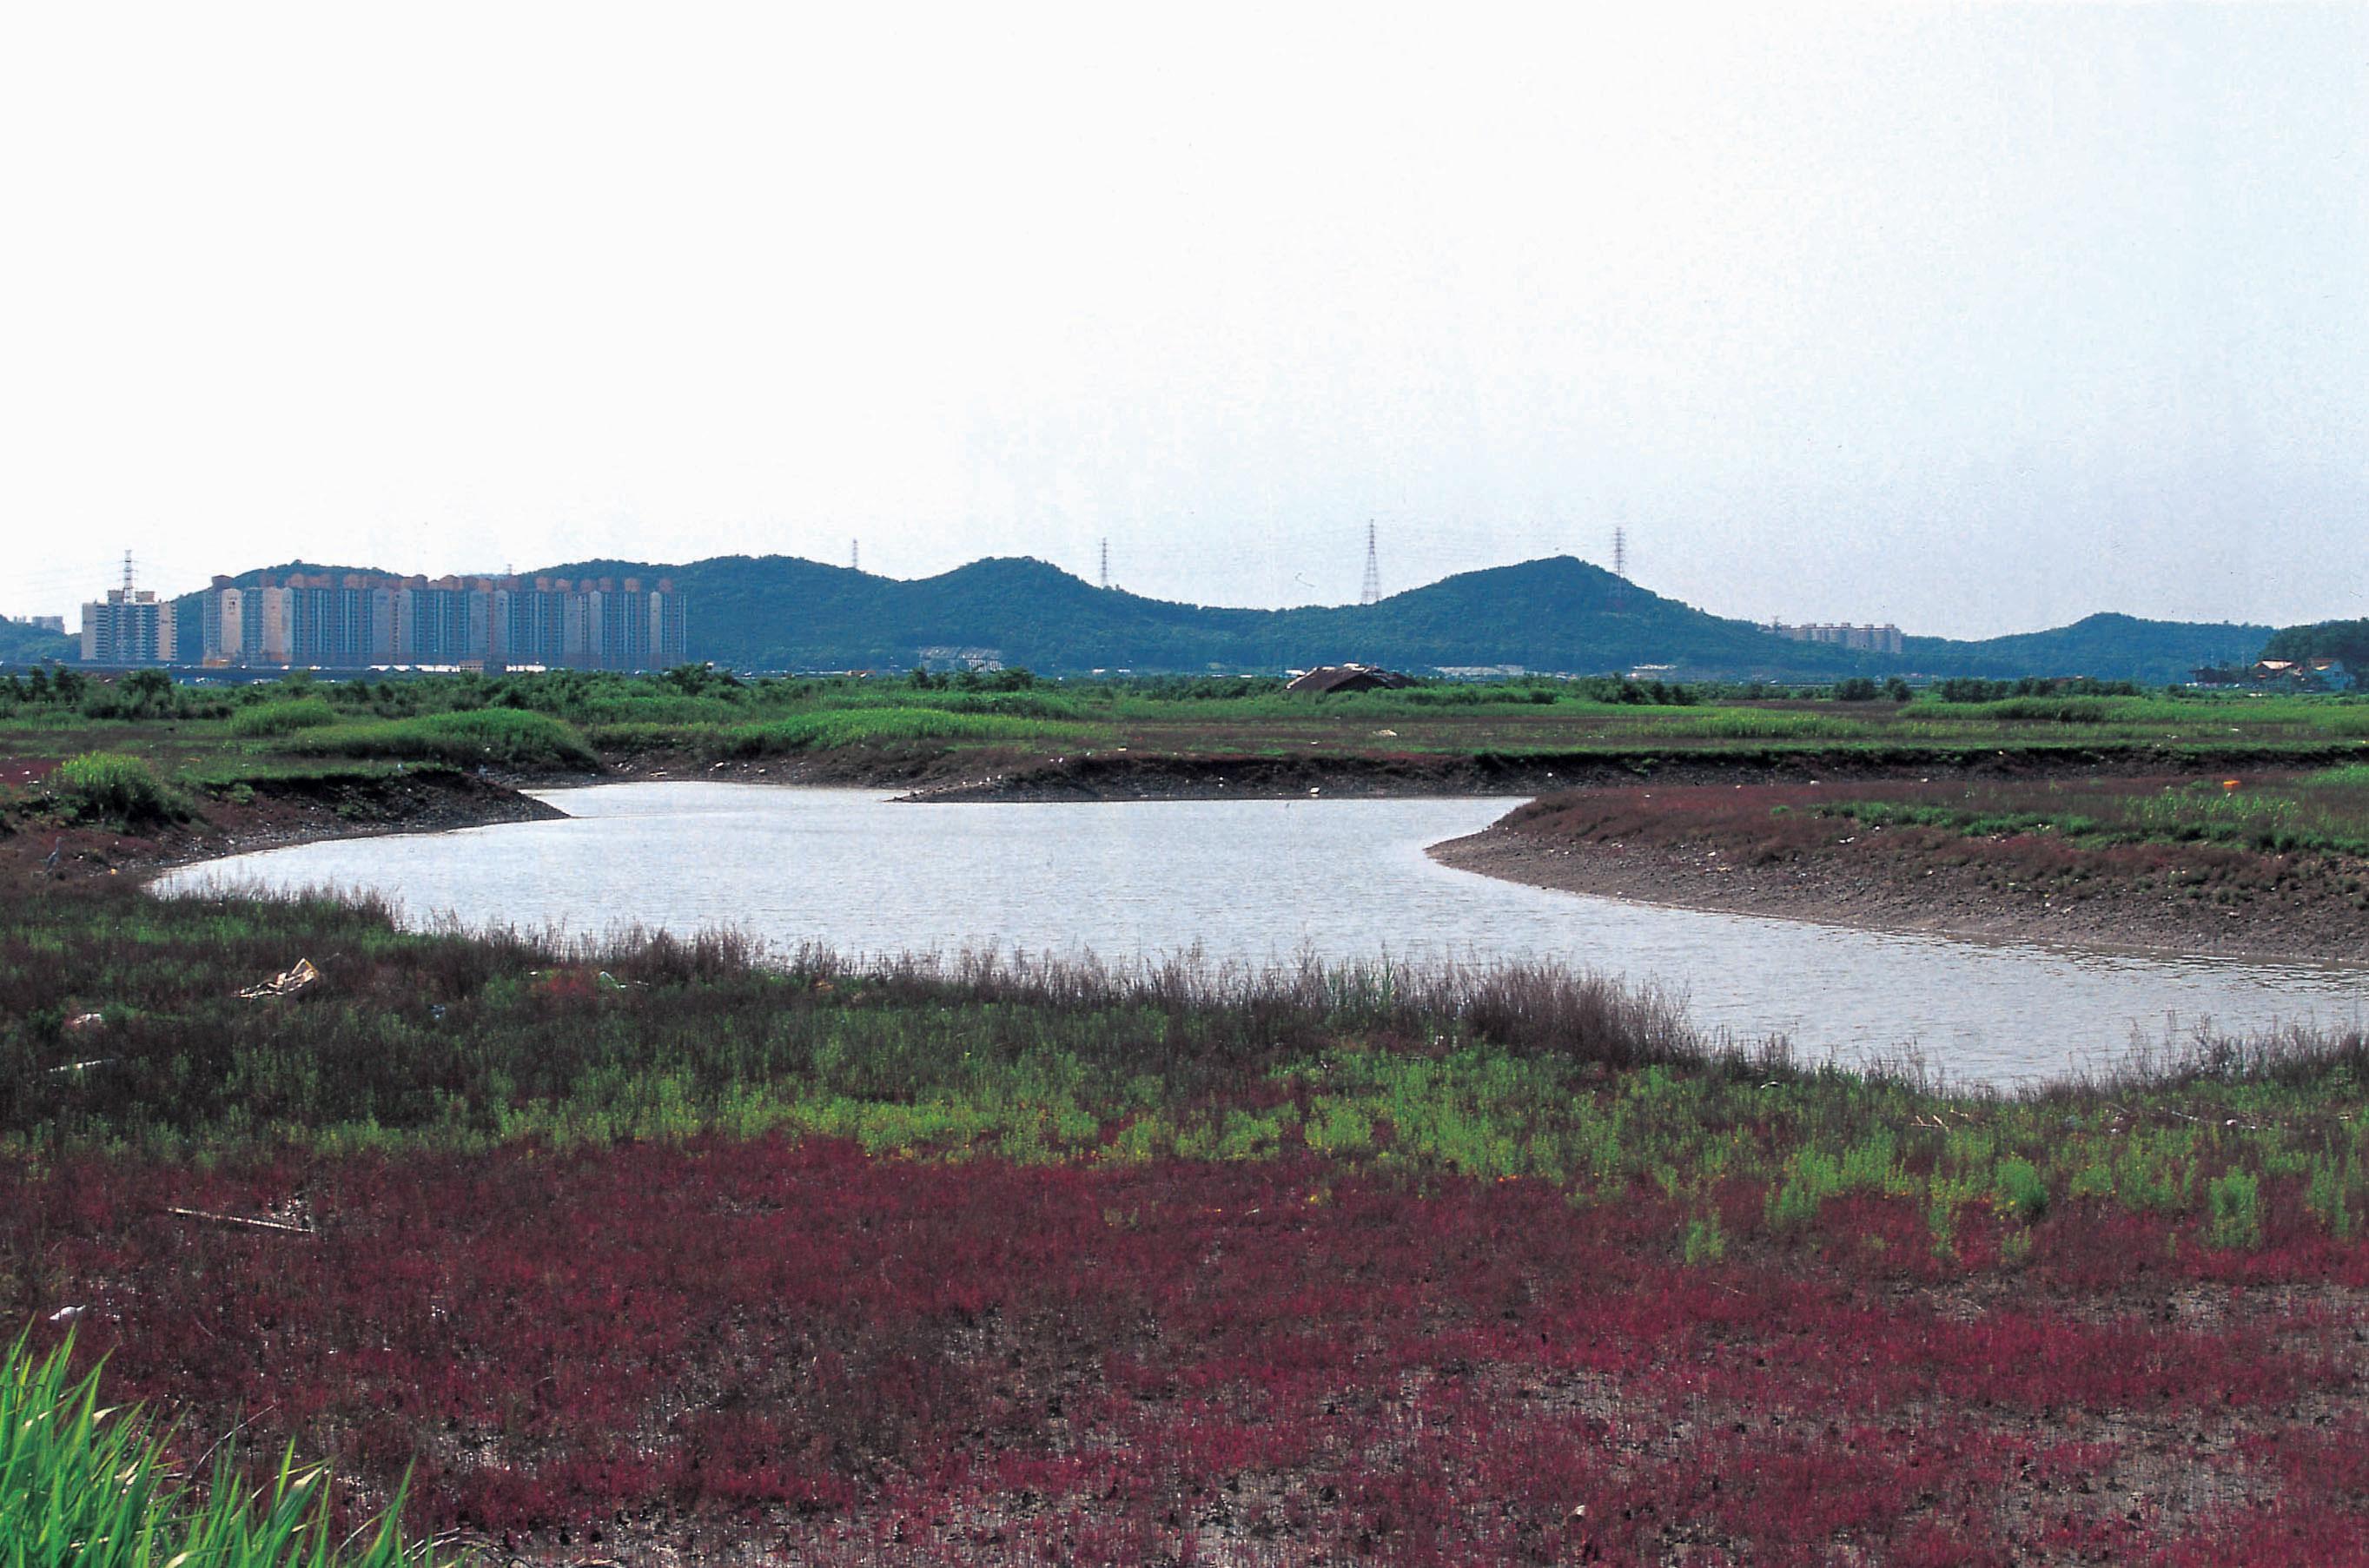 Gaetgol Eco Park